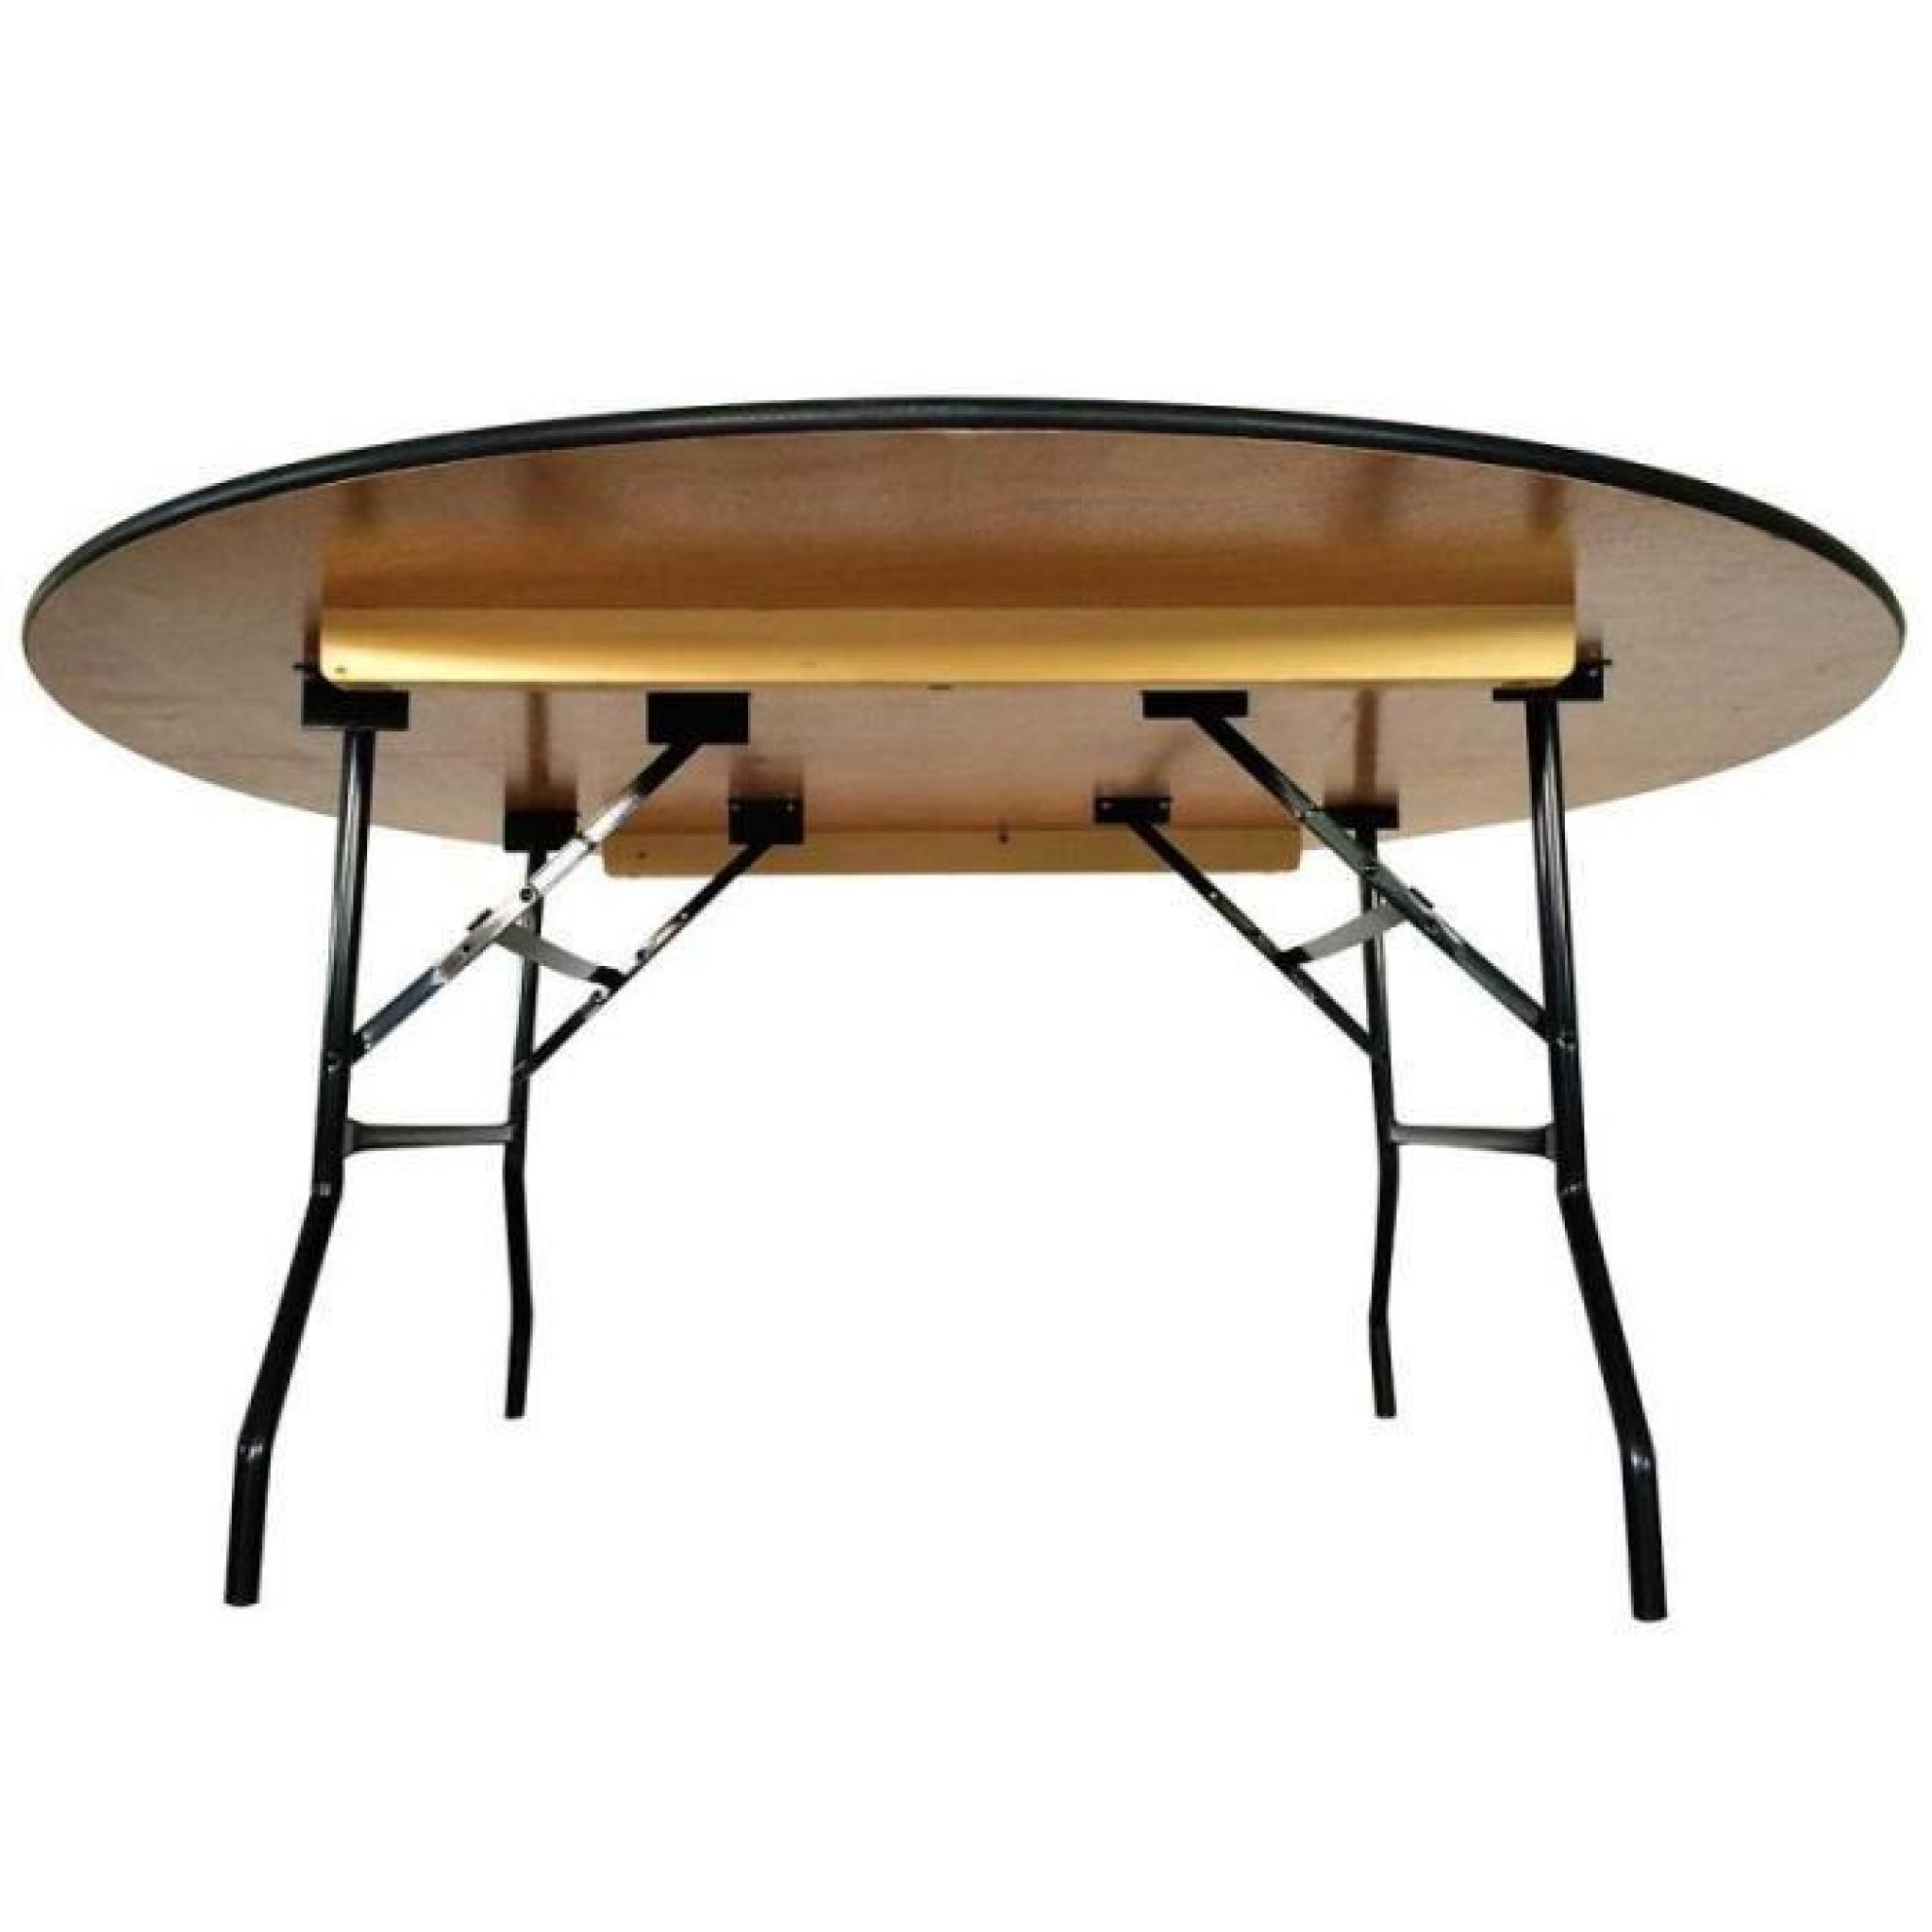 Table pliante ronde en bois 170 cm jardin Achat Vente